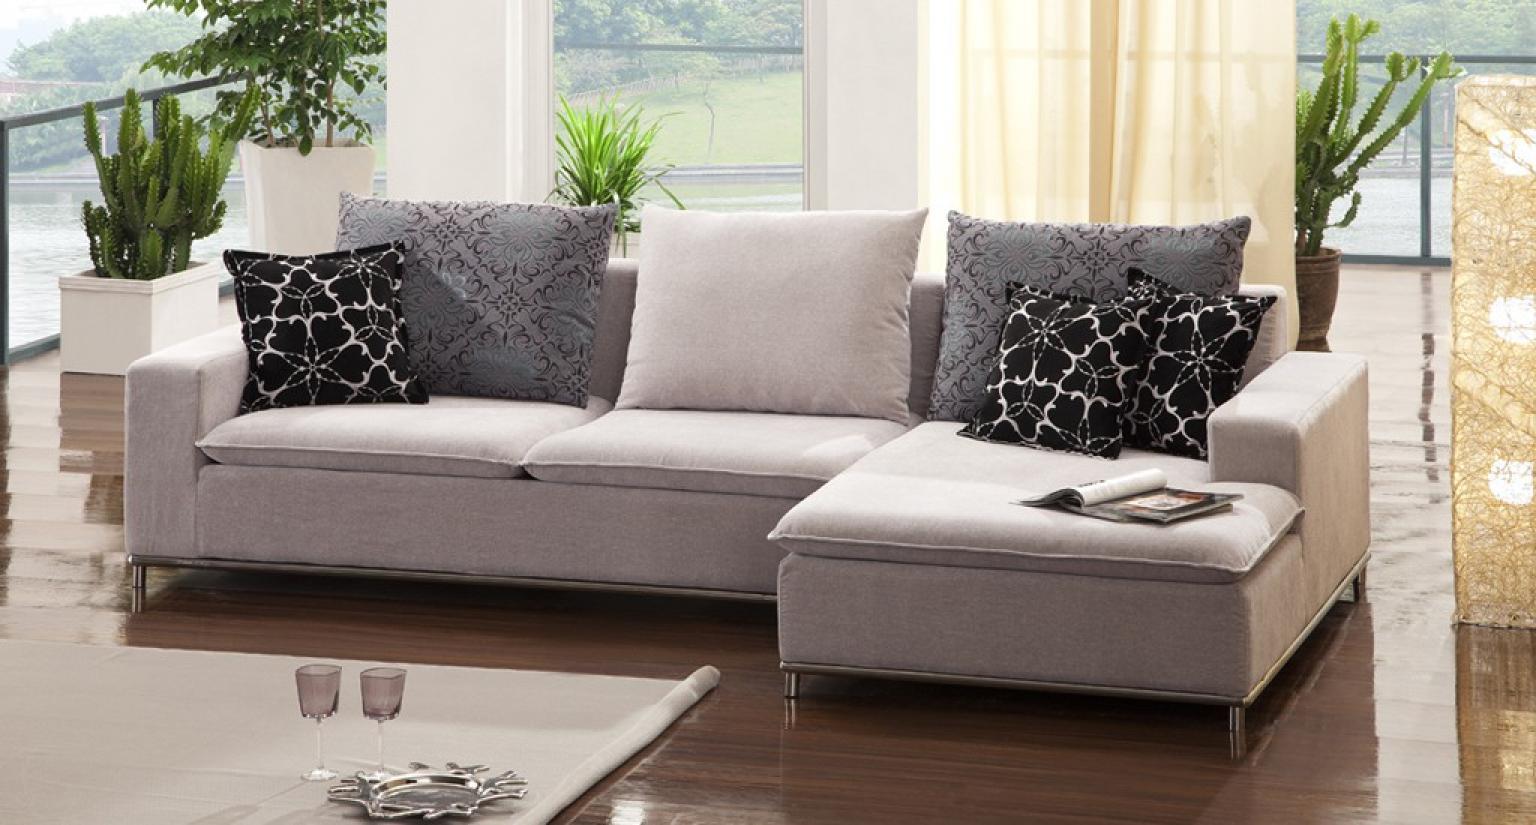 photos canap d 39 angle tissu beige. Black Bedroom Furniture Sets. Home Design Ideas